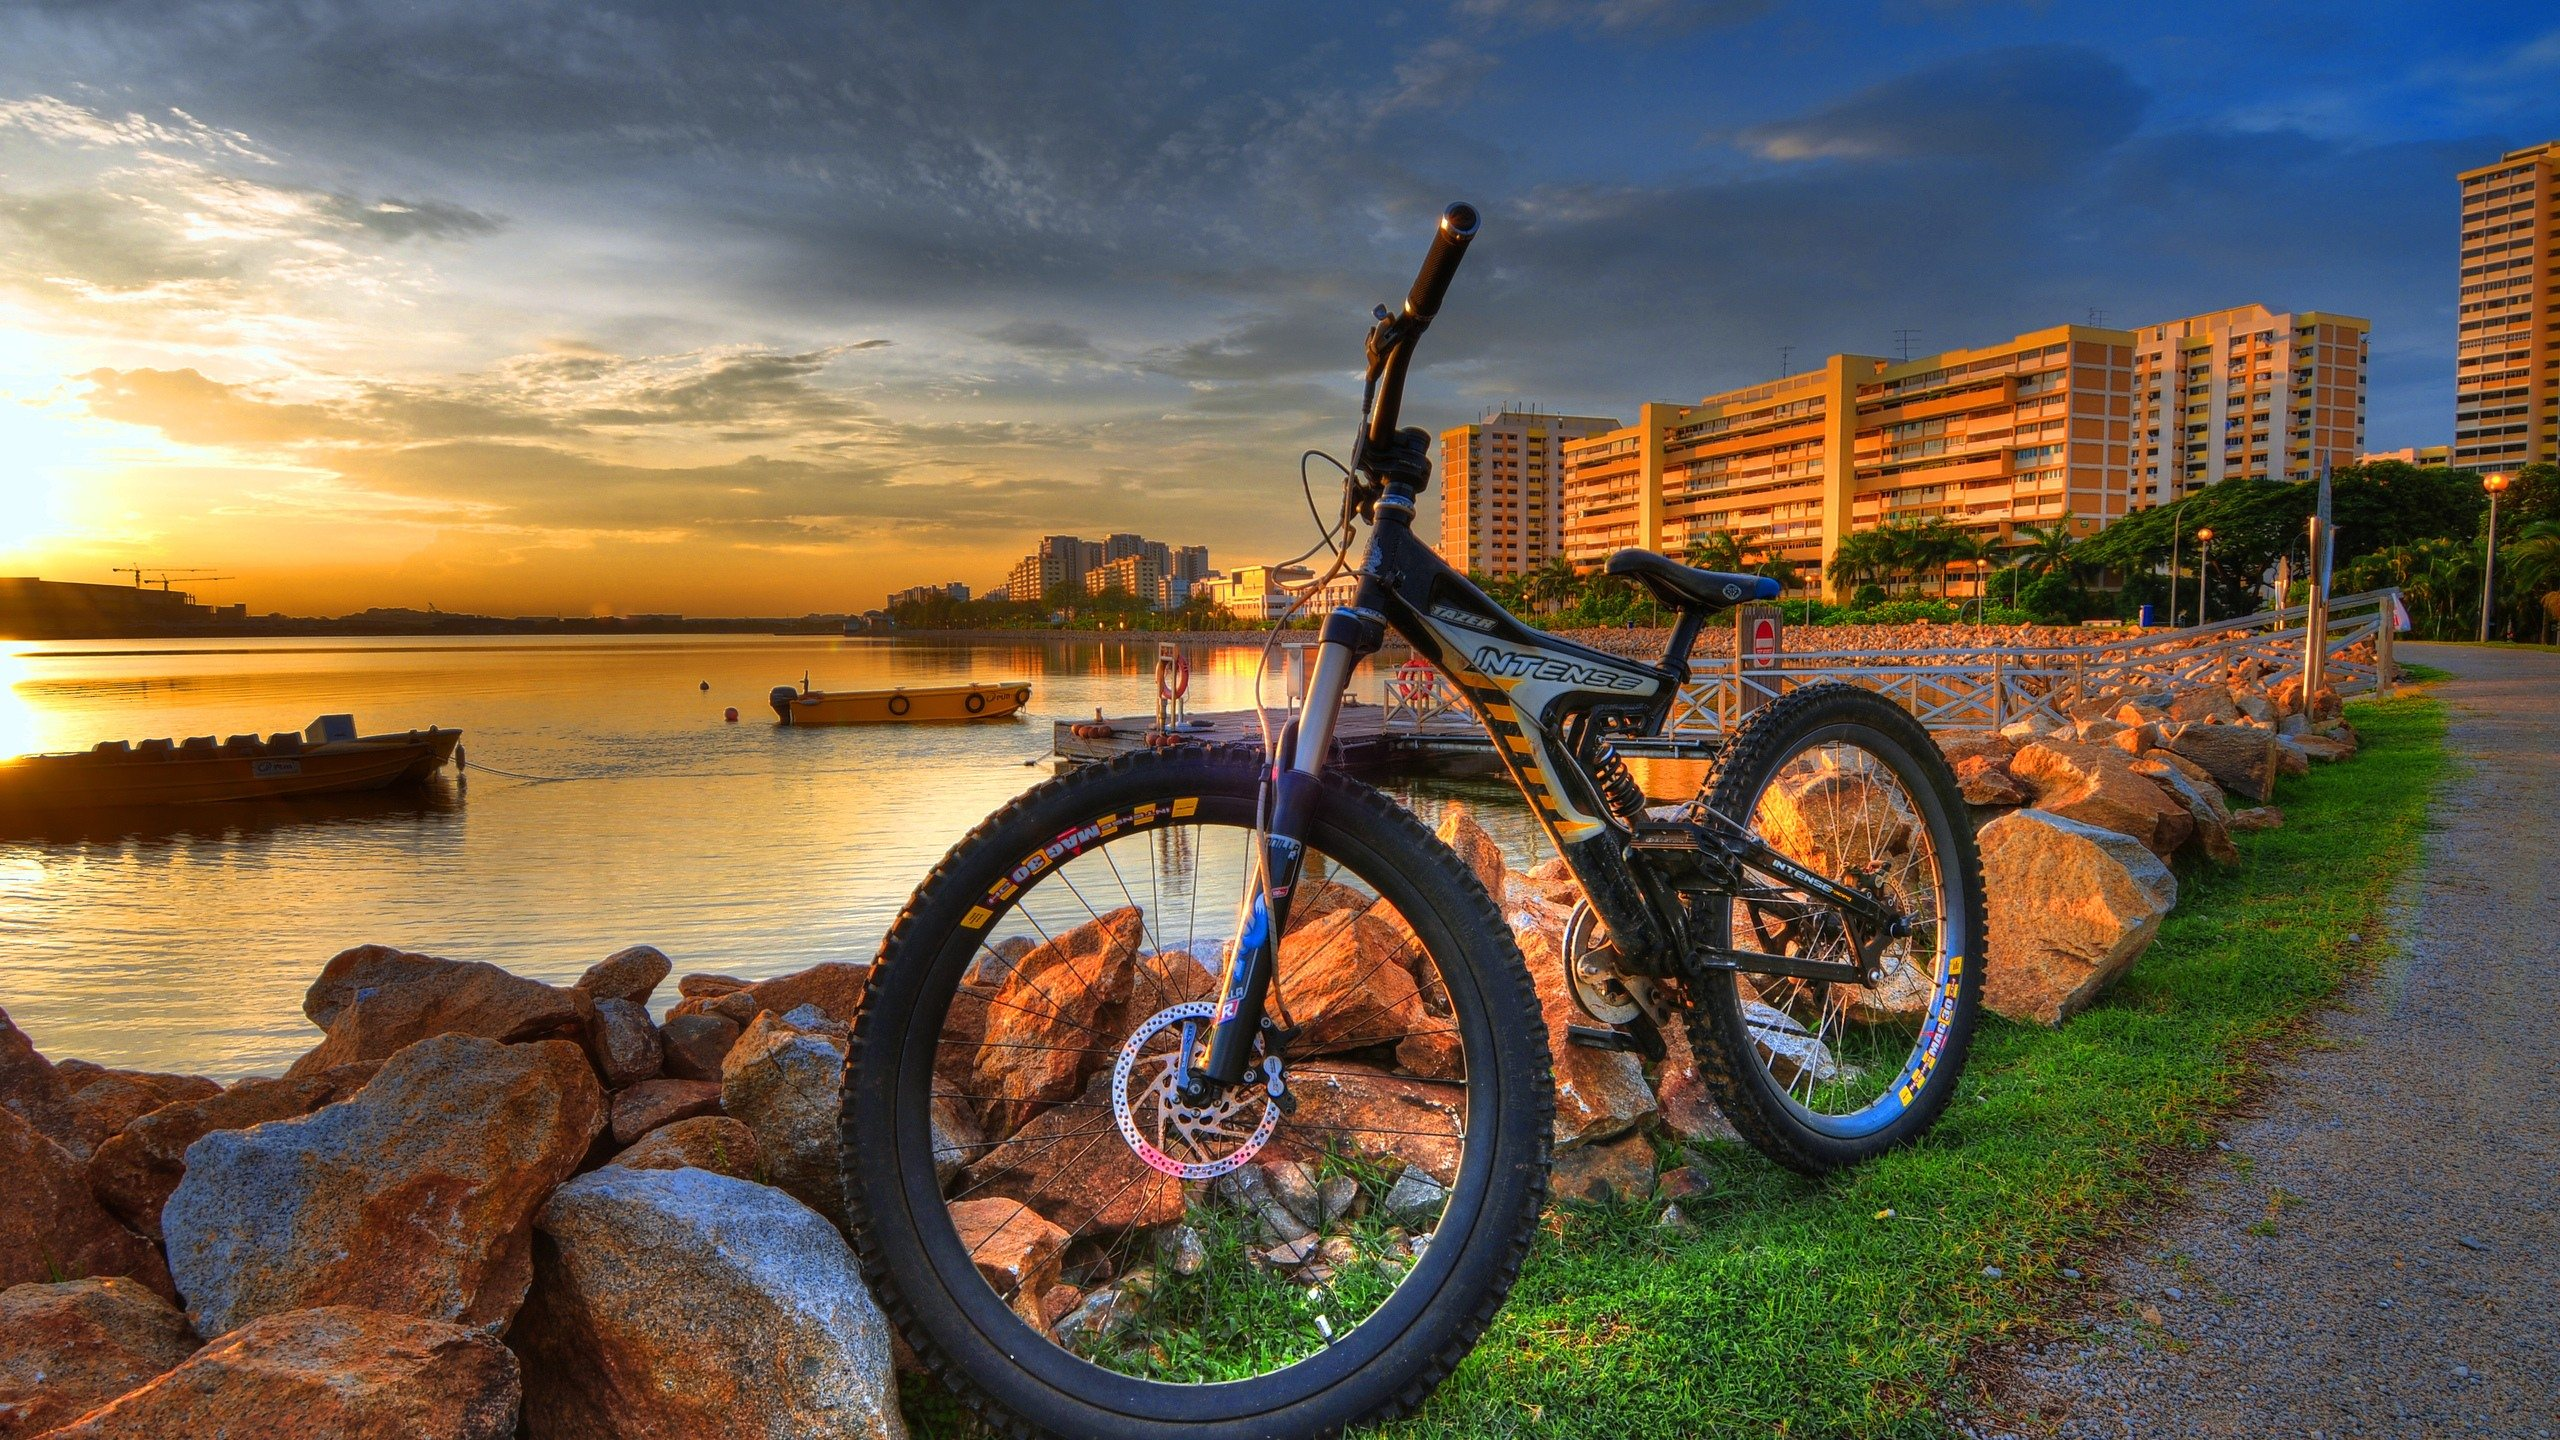 beautiful mountain bike hd wallpaper for top desktop background 2560x1440